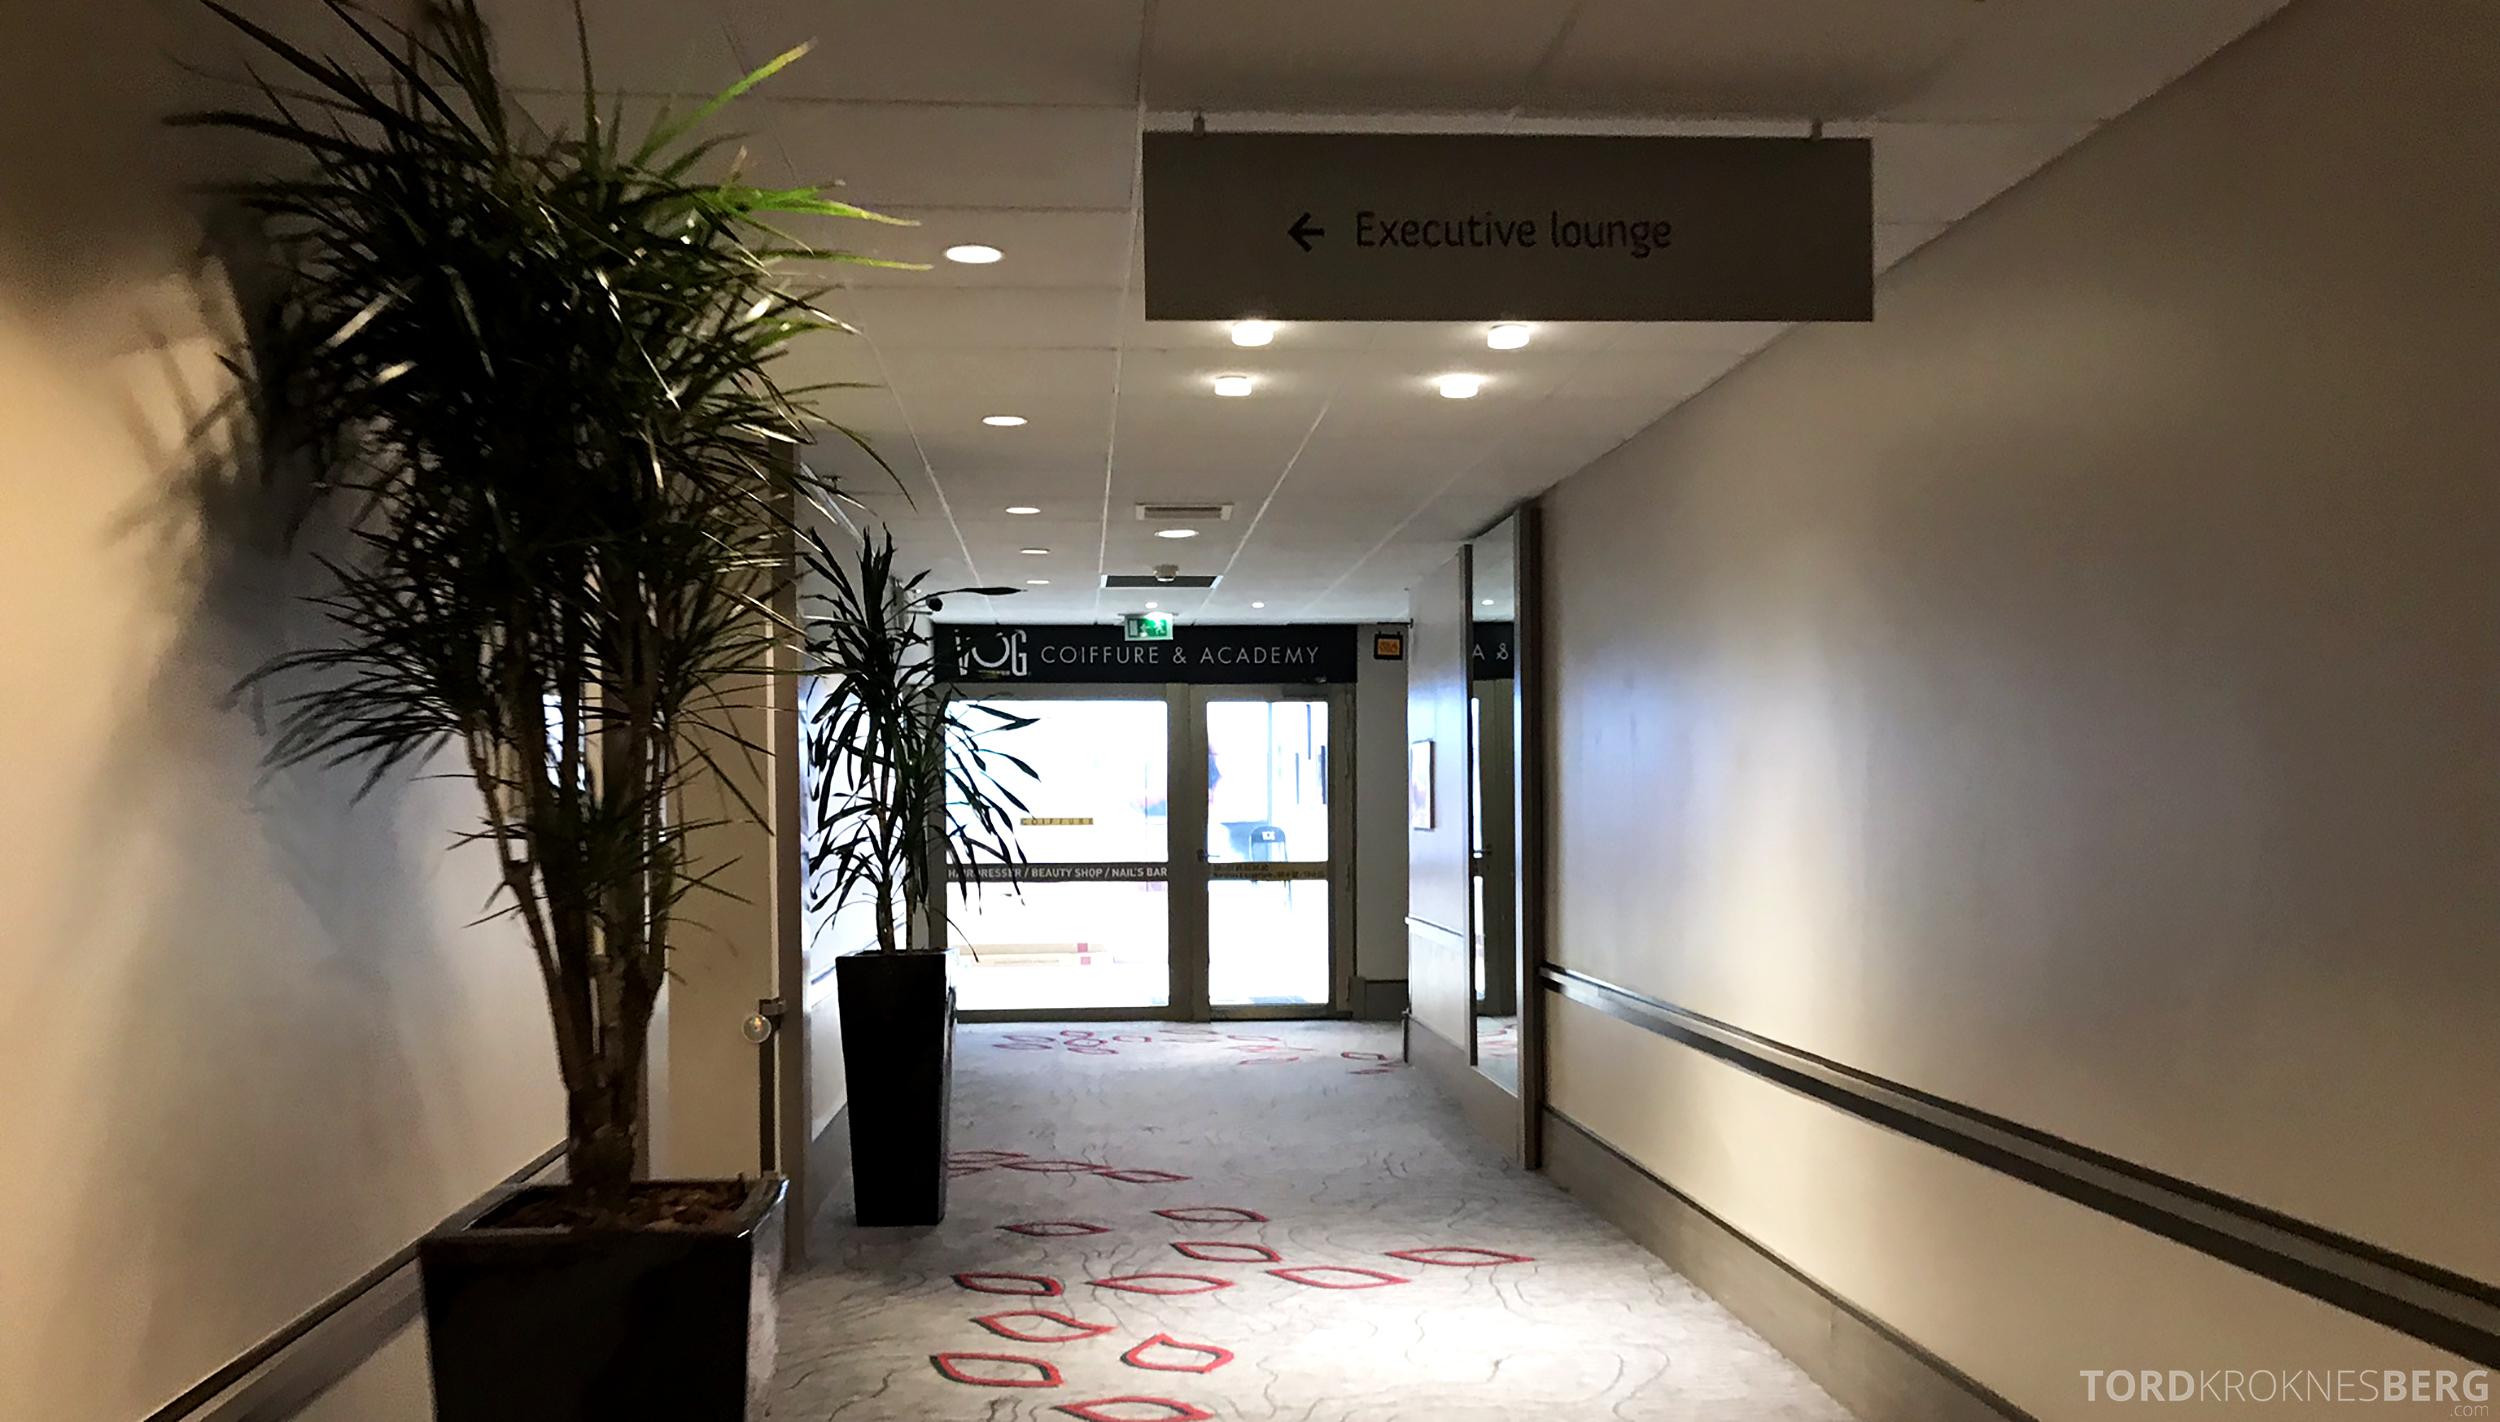 Marriott Paris Rive Gauche Executive Lounge inngang